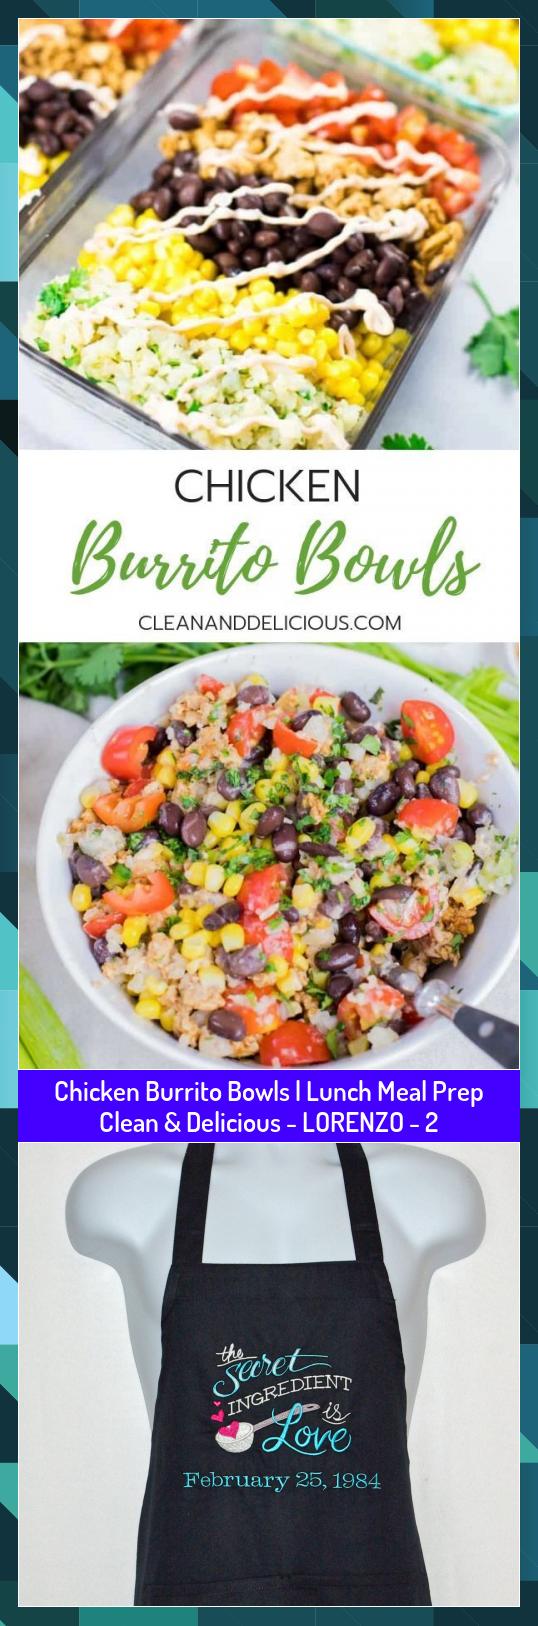 Chicken Burrito Bowls  Lunch Meal Prep Clean  Delicious  LORENZO  2